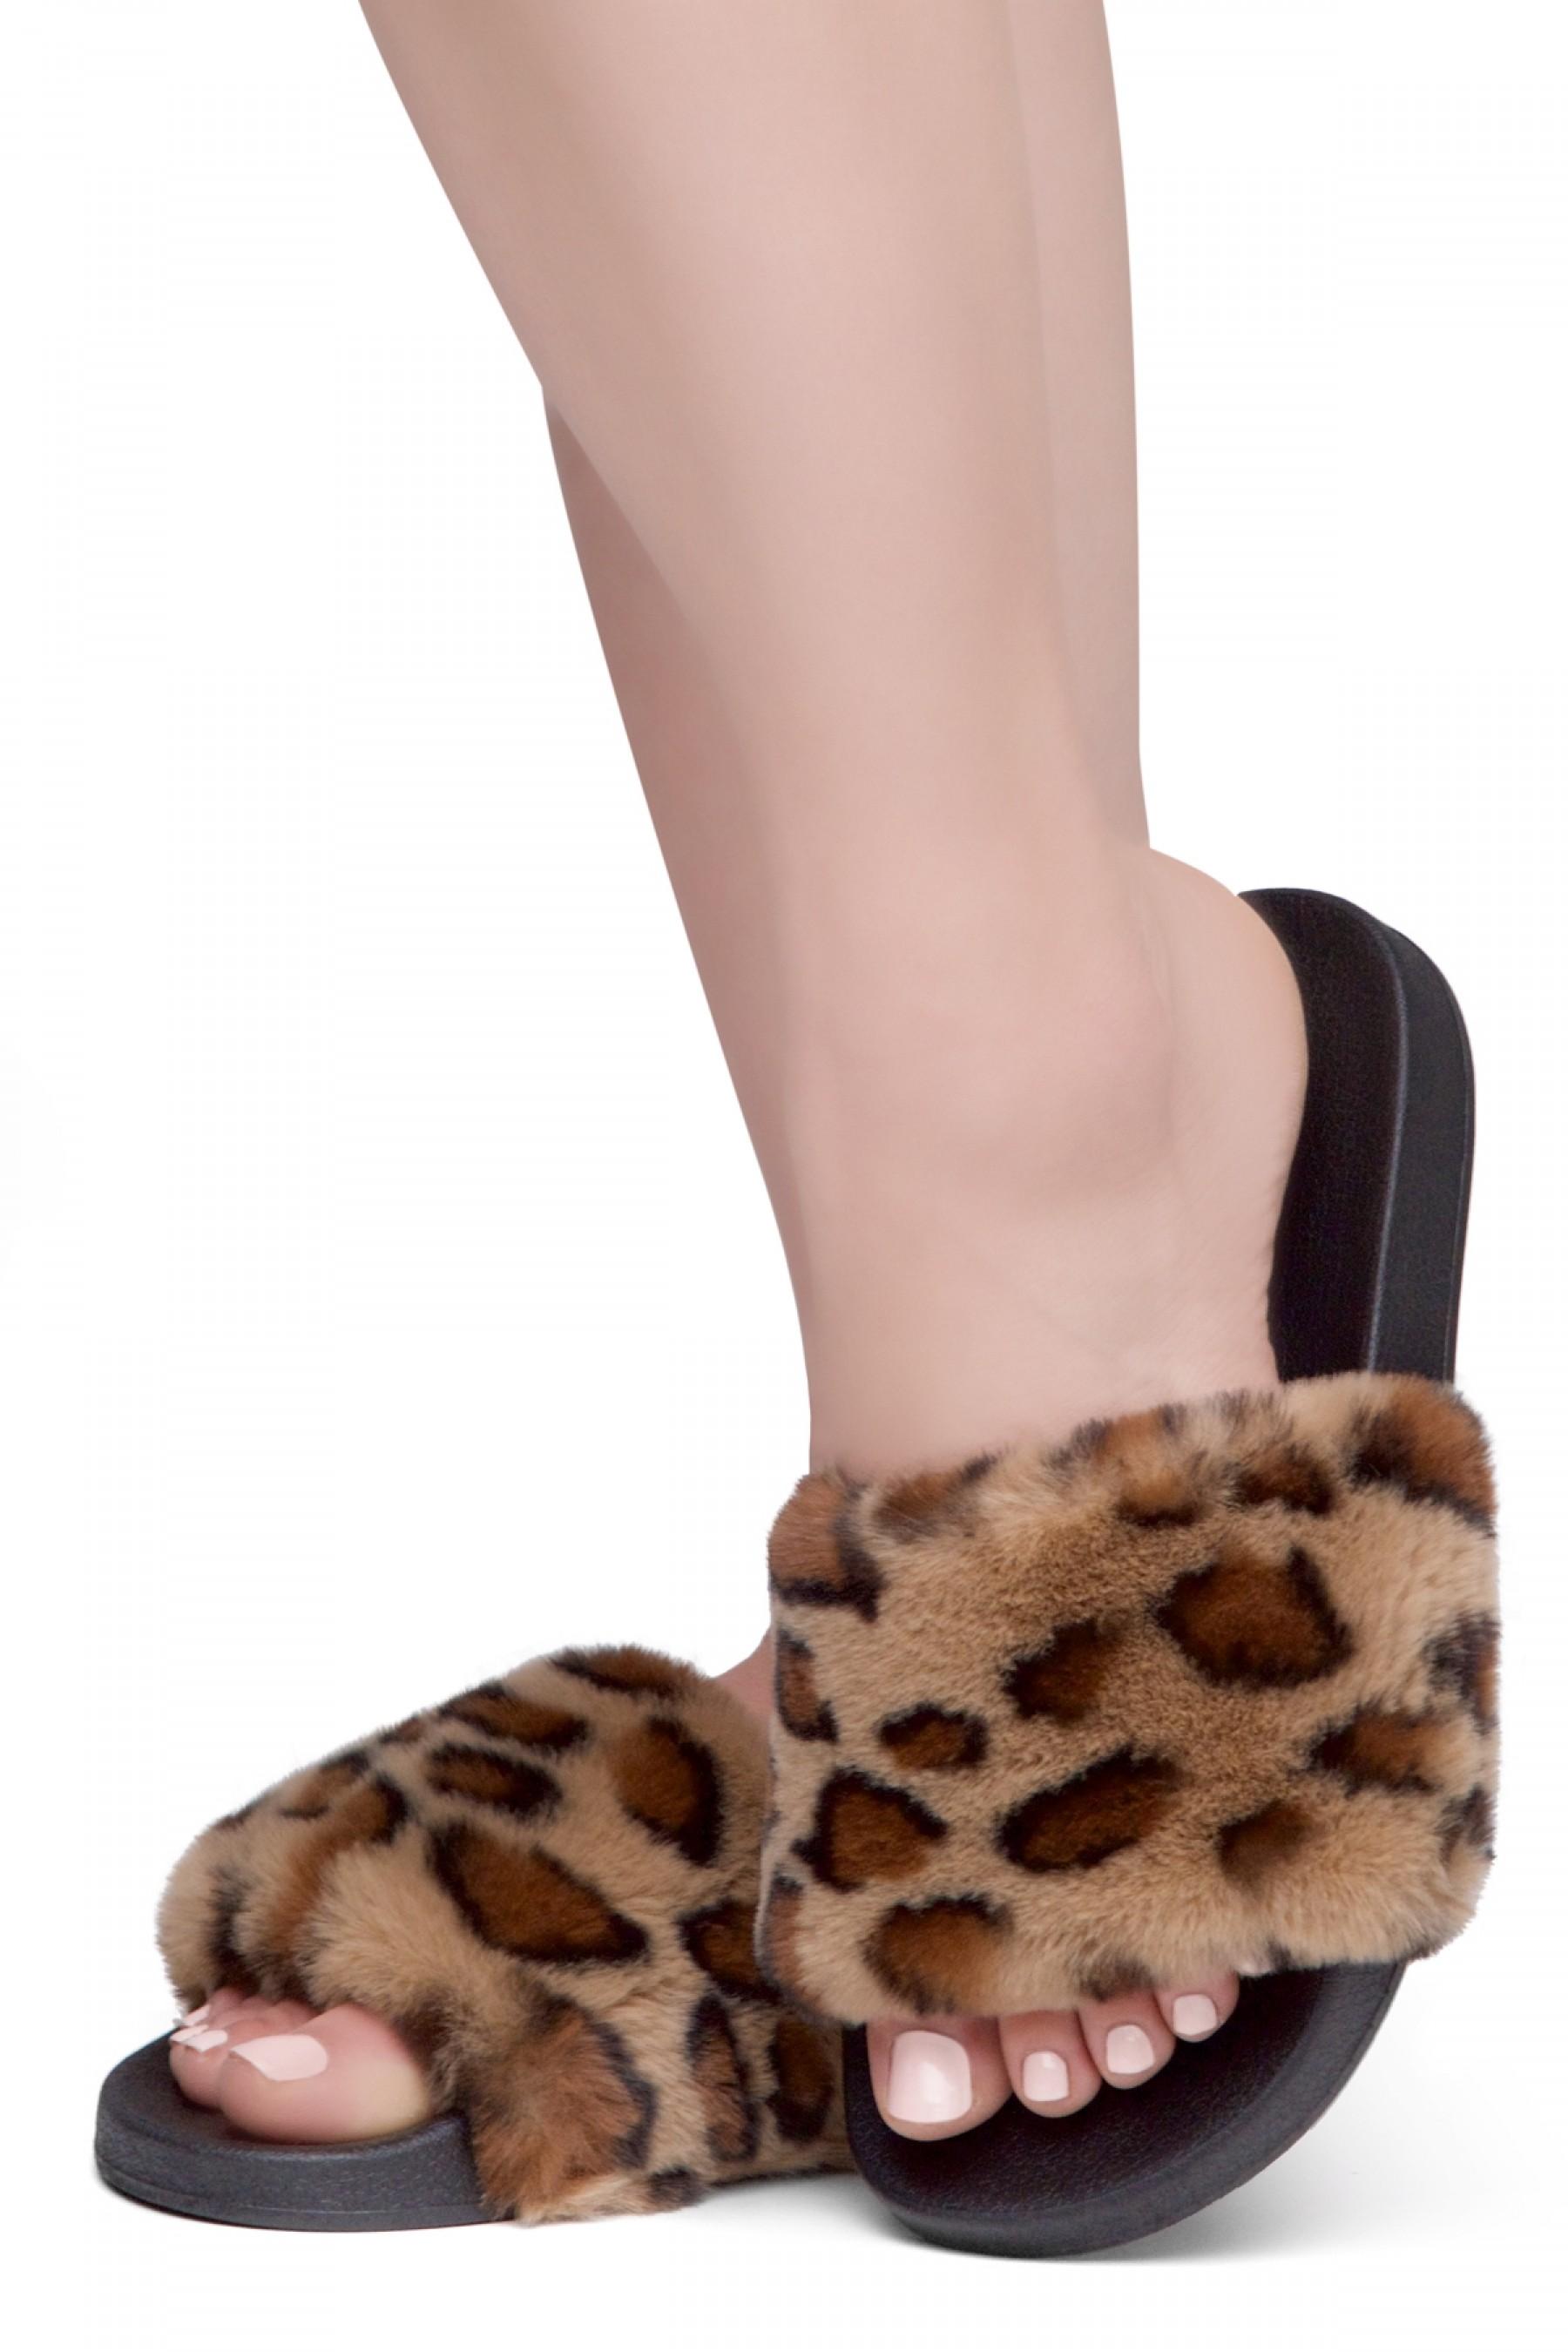 Shoe Land SL-Best Wishes-Women's Fashion Furry Slide Slip On Sandals (LEOPSPU/BLK)